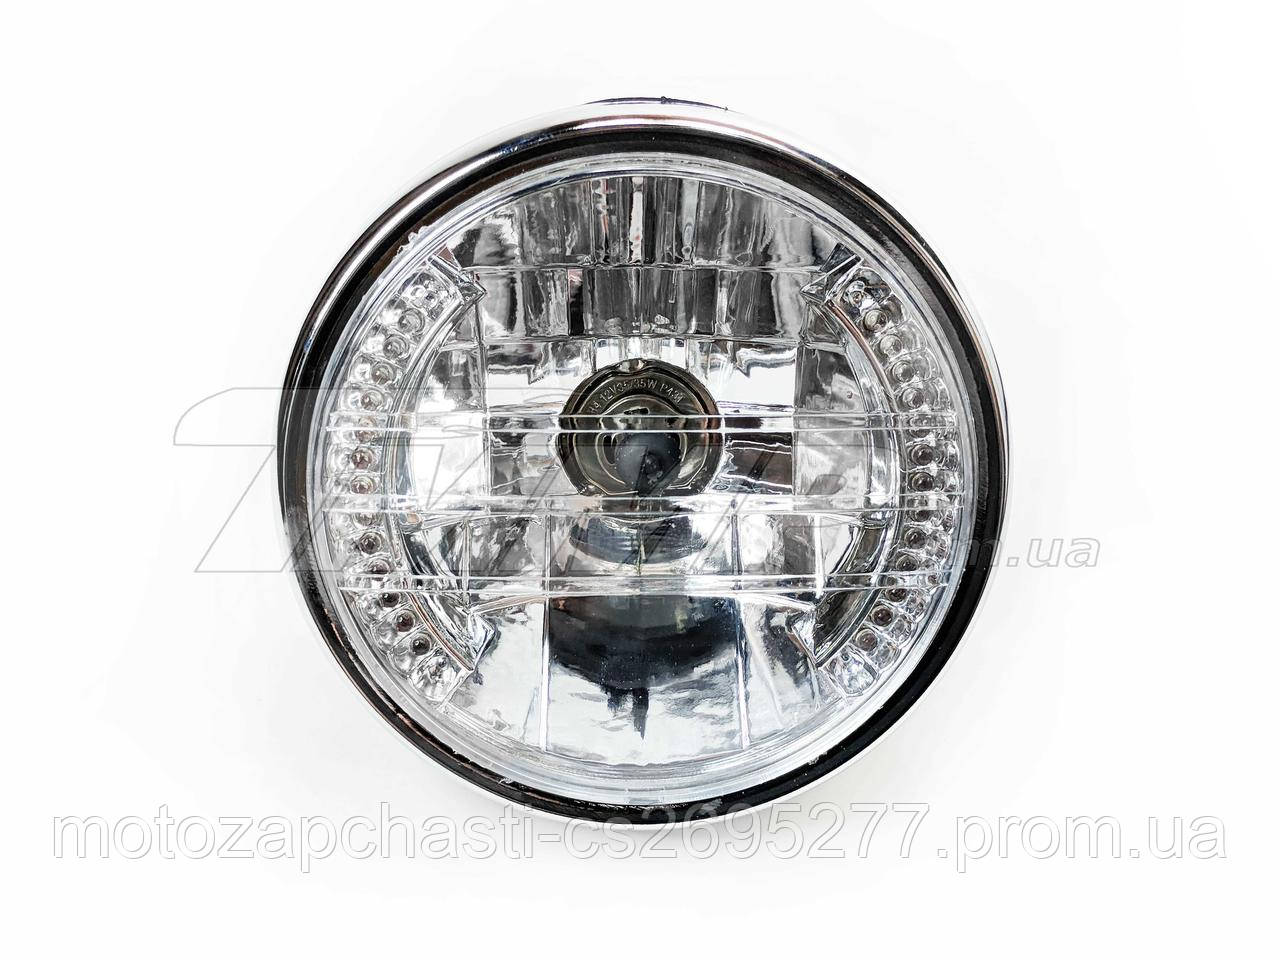 Фара круглая Honda с LED подсветкой TRW